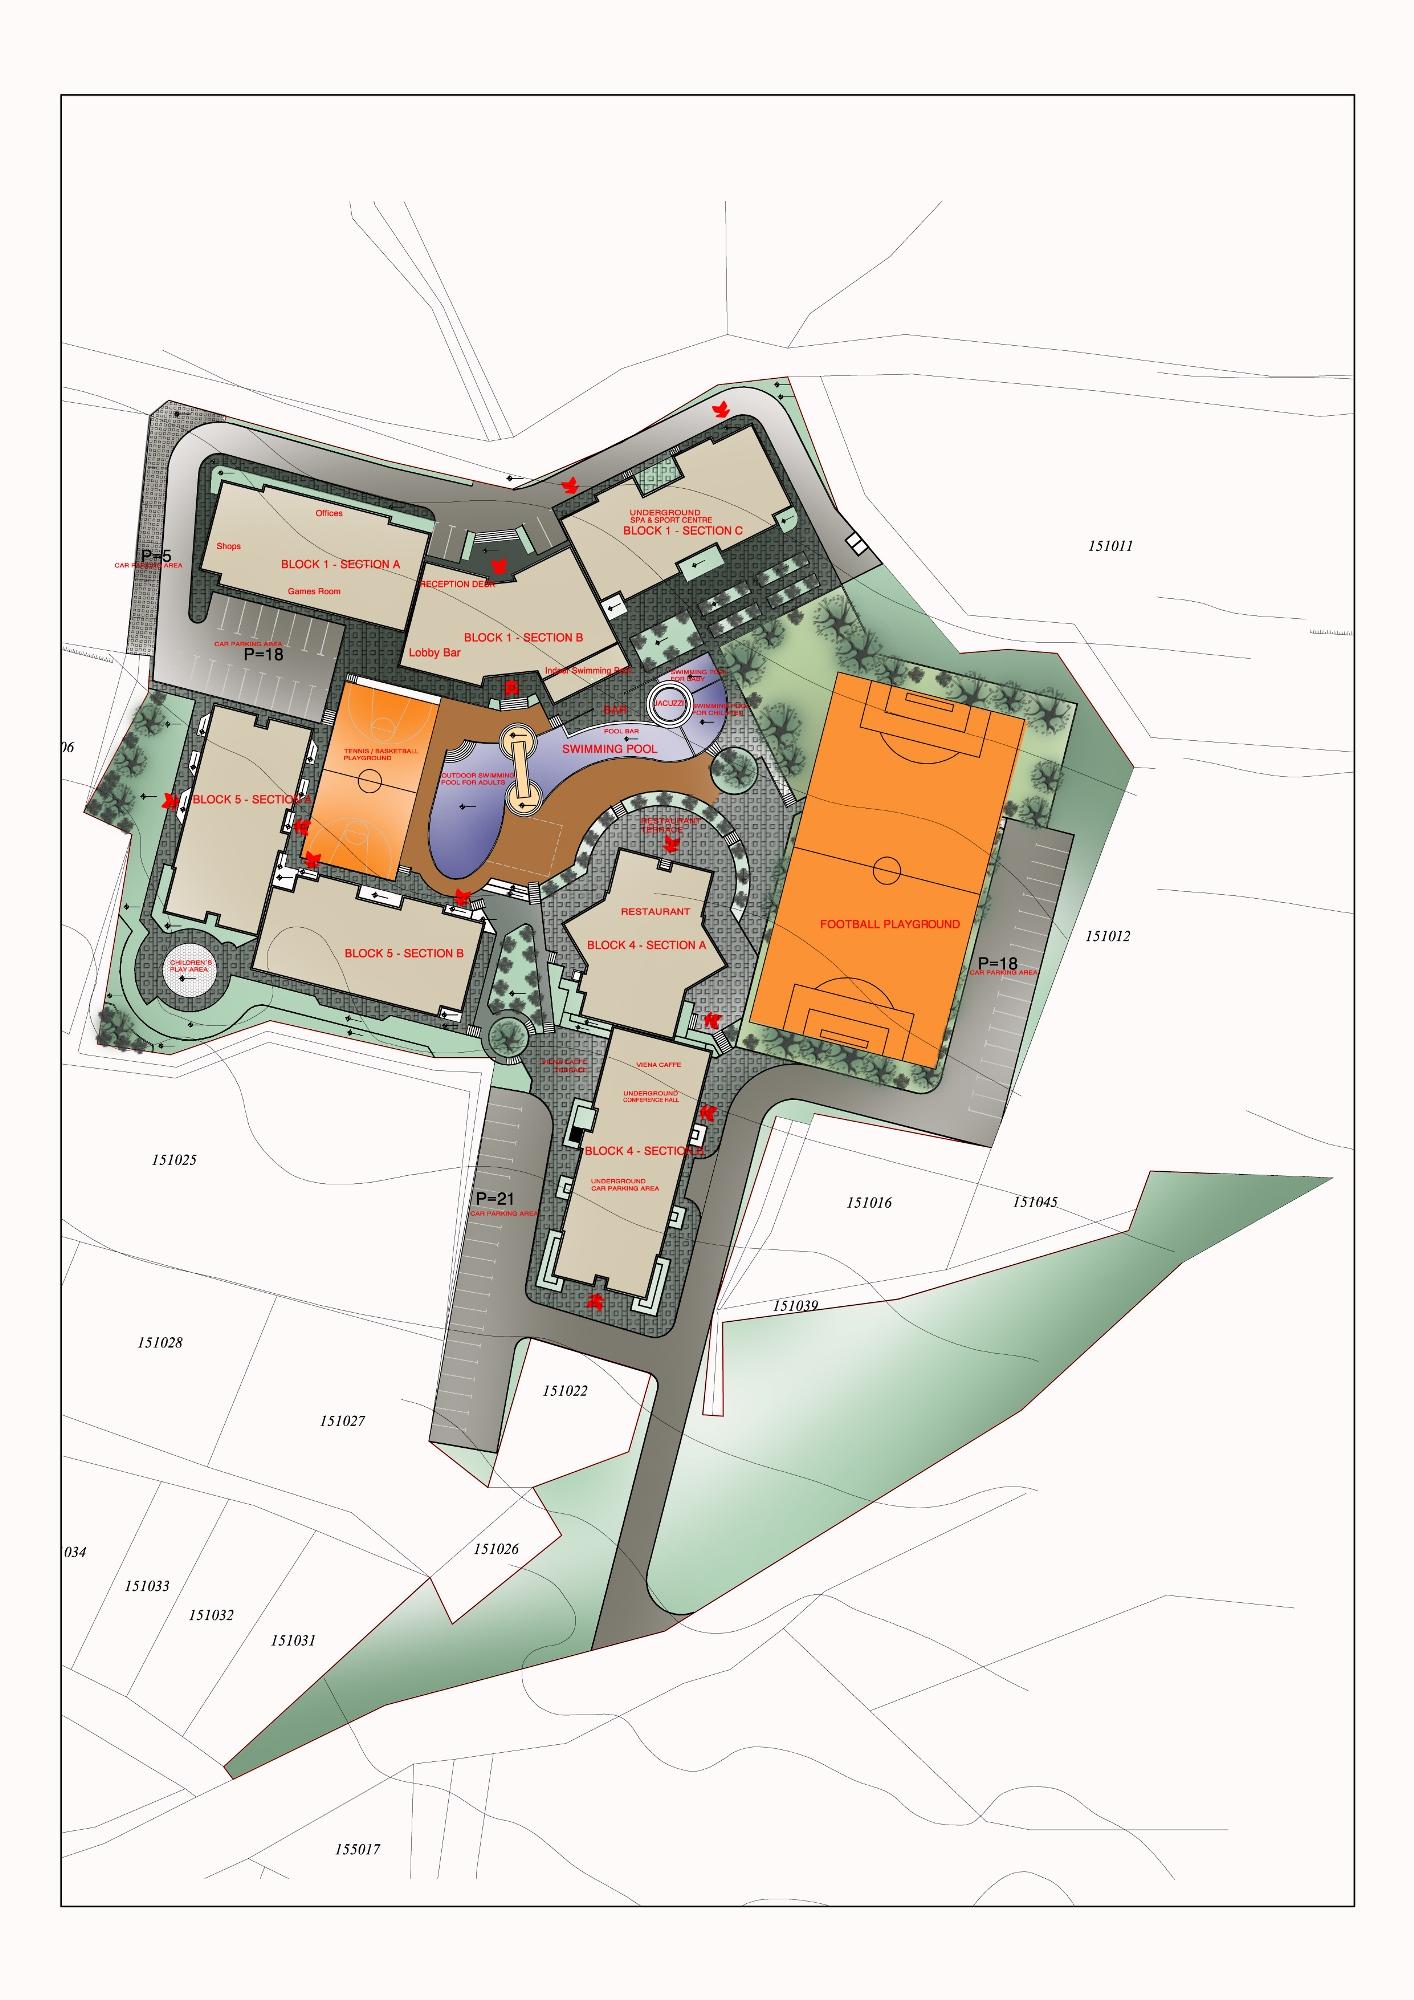 Генерален план: Belvedere Holiday Club жилищен комплекс от затворен тип